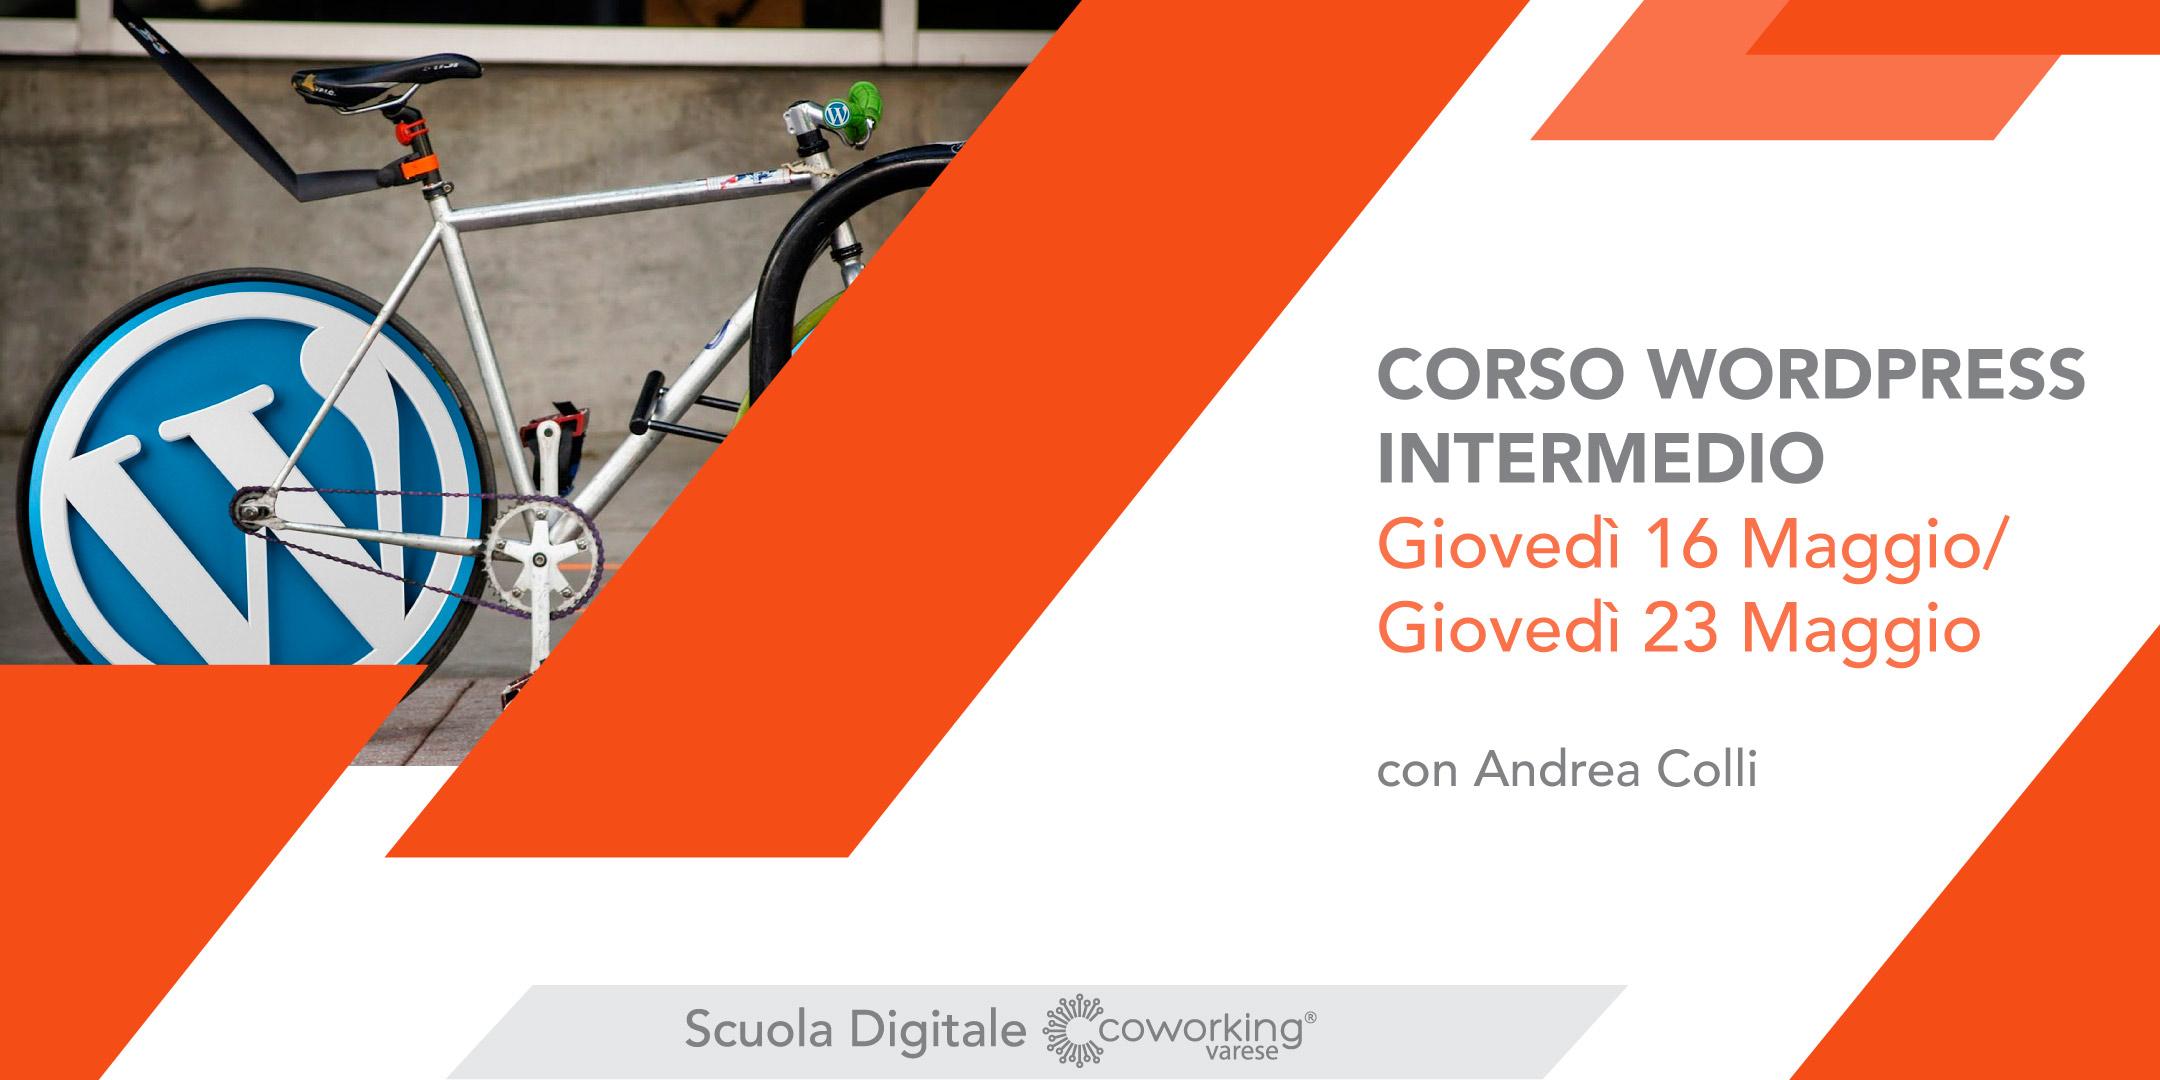 Corso Worpress Intermedio Varese